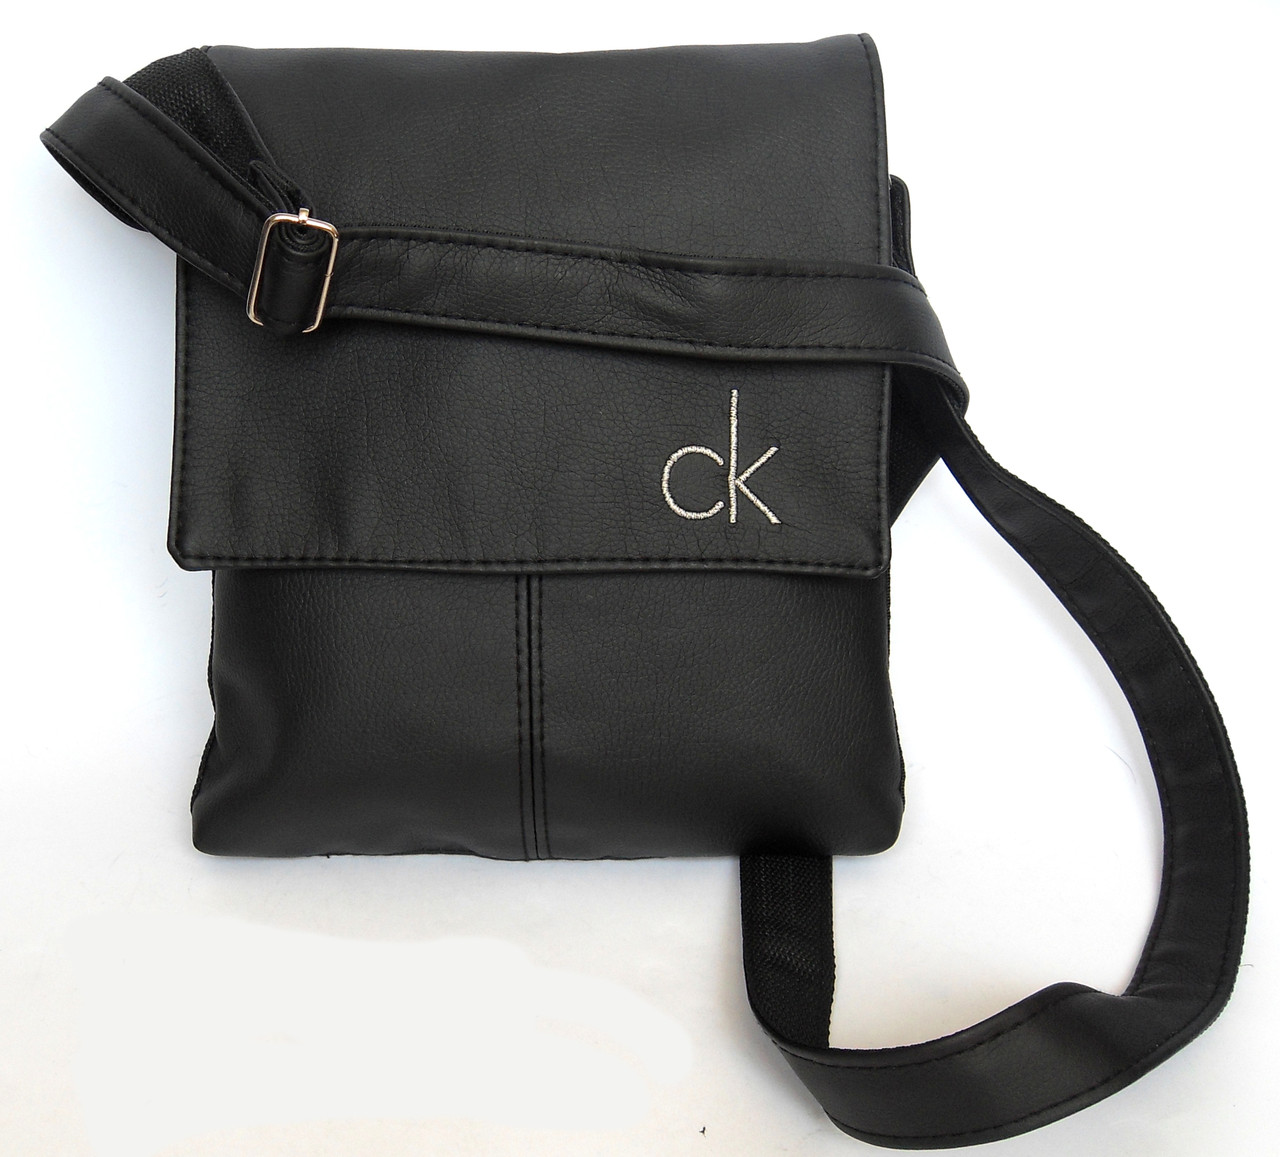 b1805bf76350 Calvin Klein Мужская сумка через плечо в стиле СК Calvin Klein - интернет  магазин